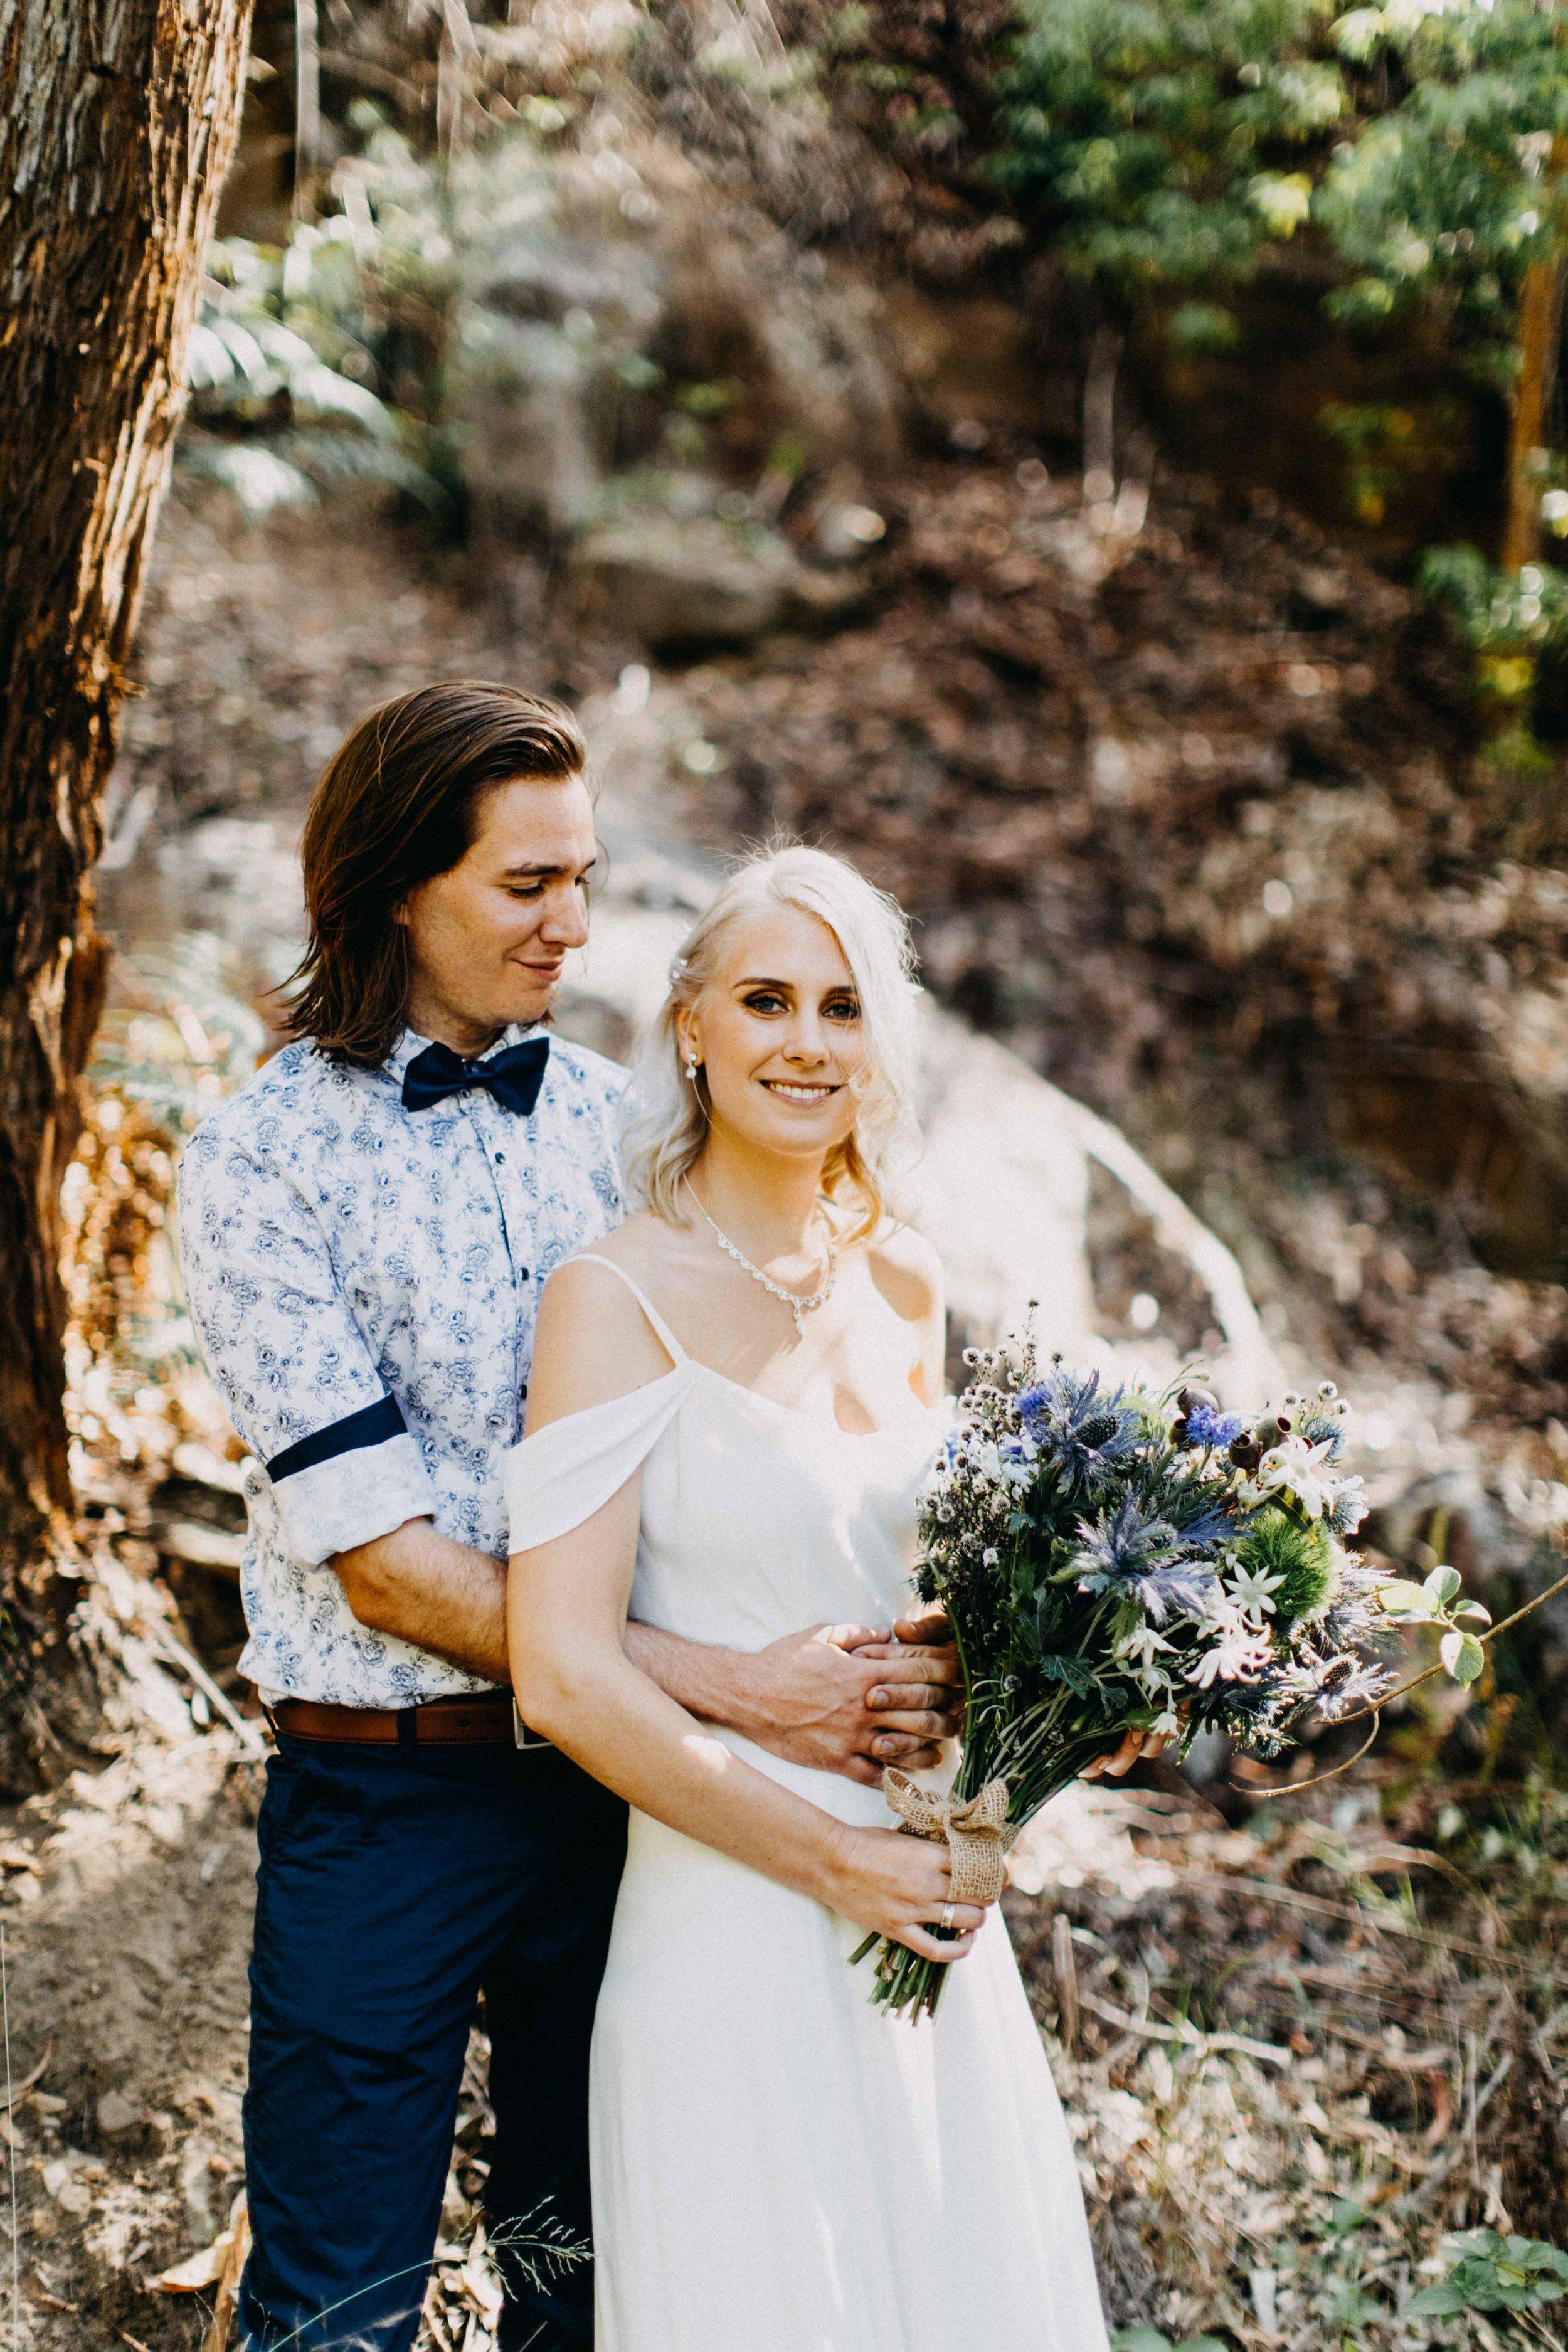 wisemans-ferry-wedding-www.emilyobrienphotography.net-33.jpg